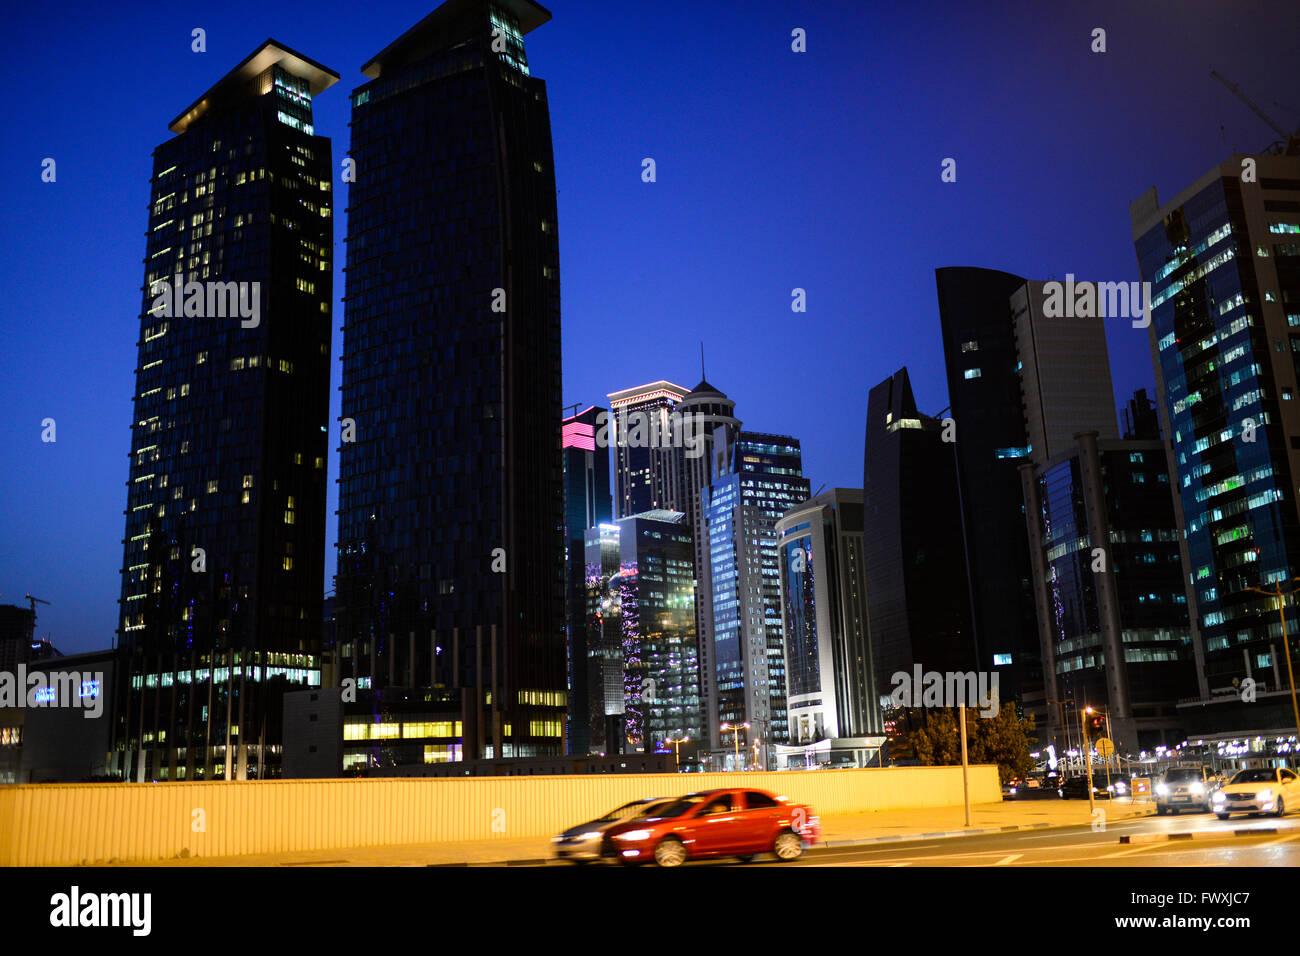 QATAR, Doha, skyscraper east bay / KATAR, Doha, Wolkenkratzer der Eastbay - Stock Image